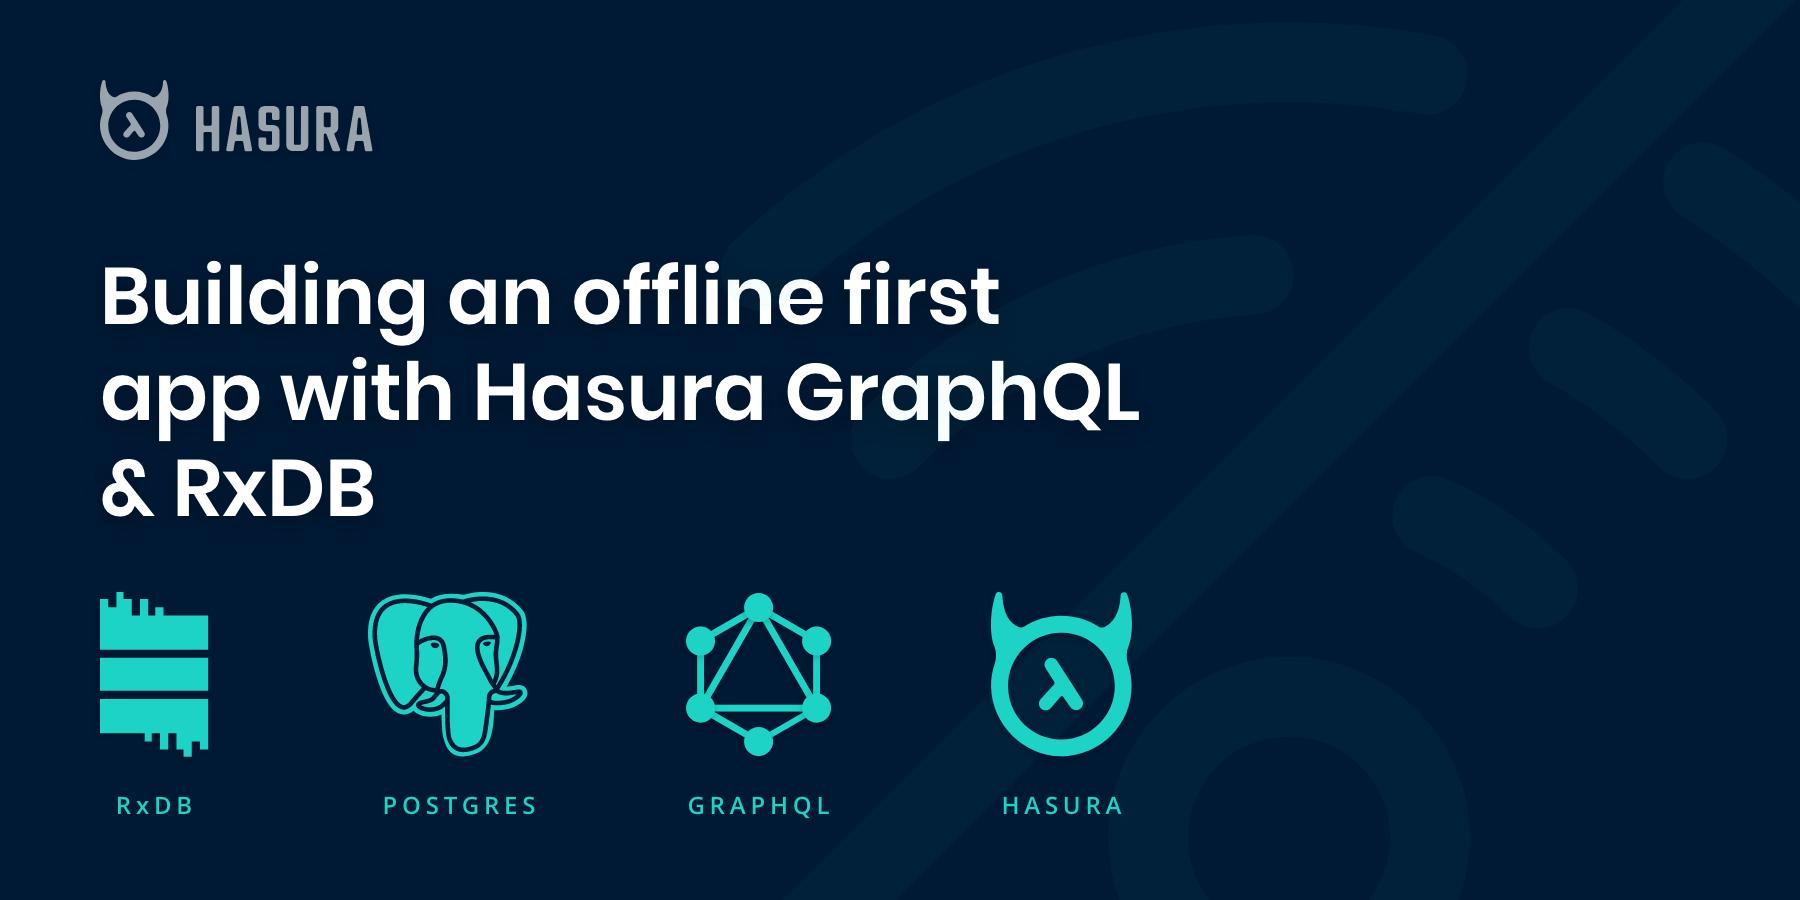 Building an offline first web app with RxDB & Hasura